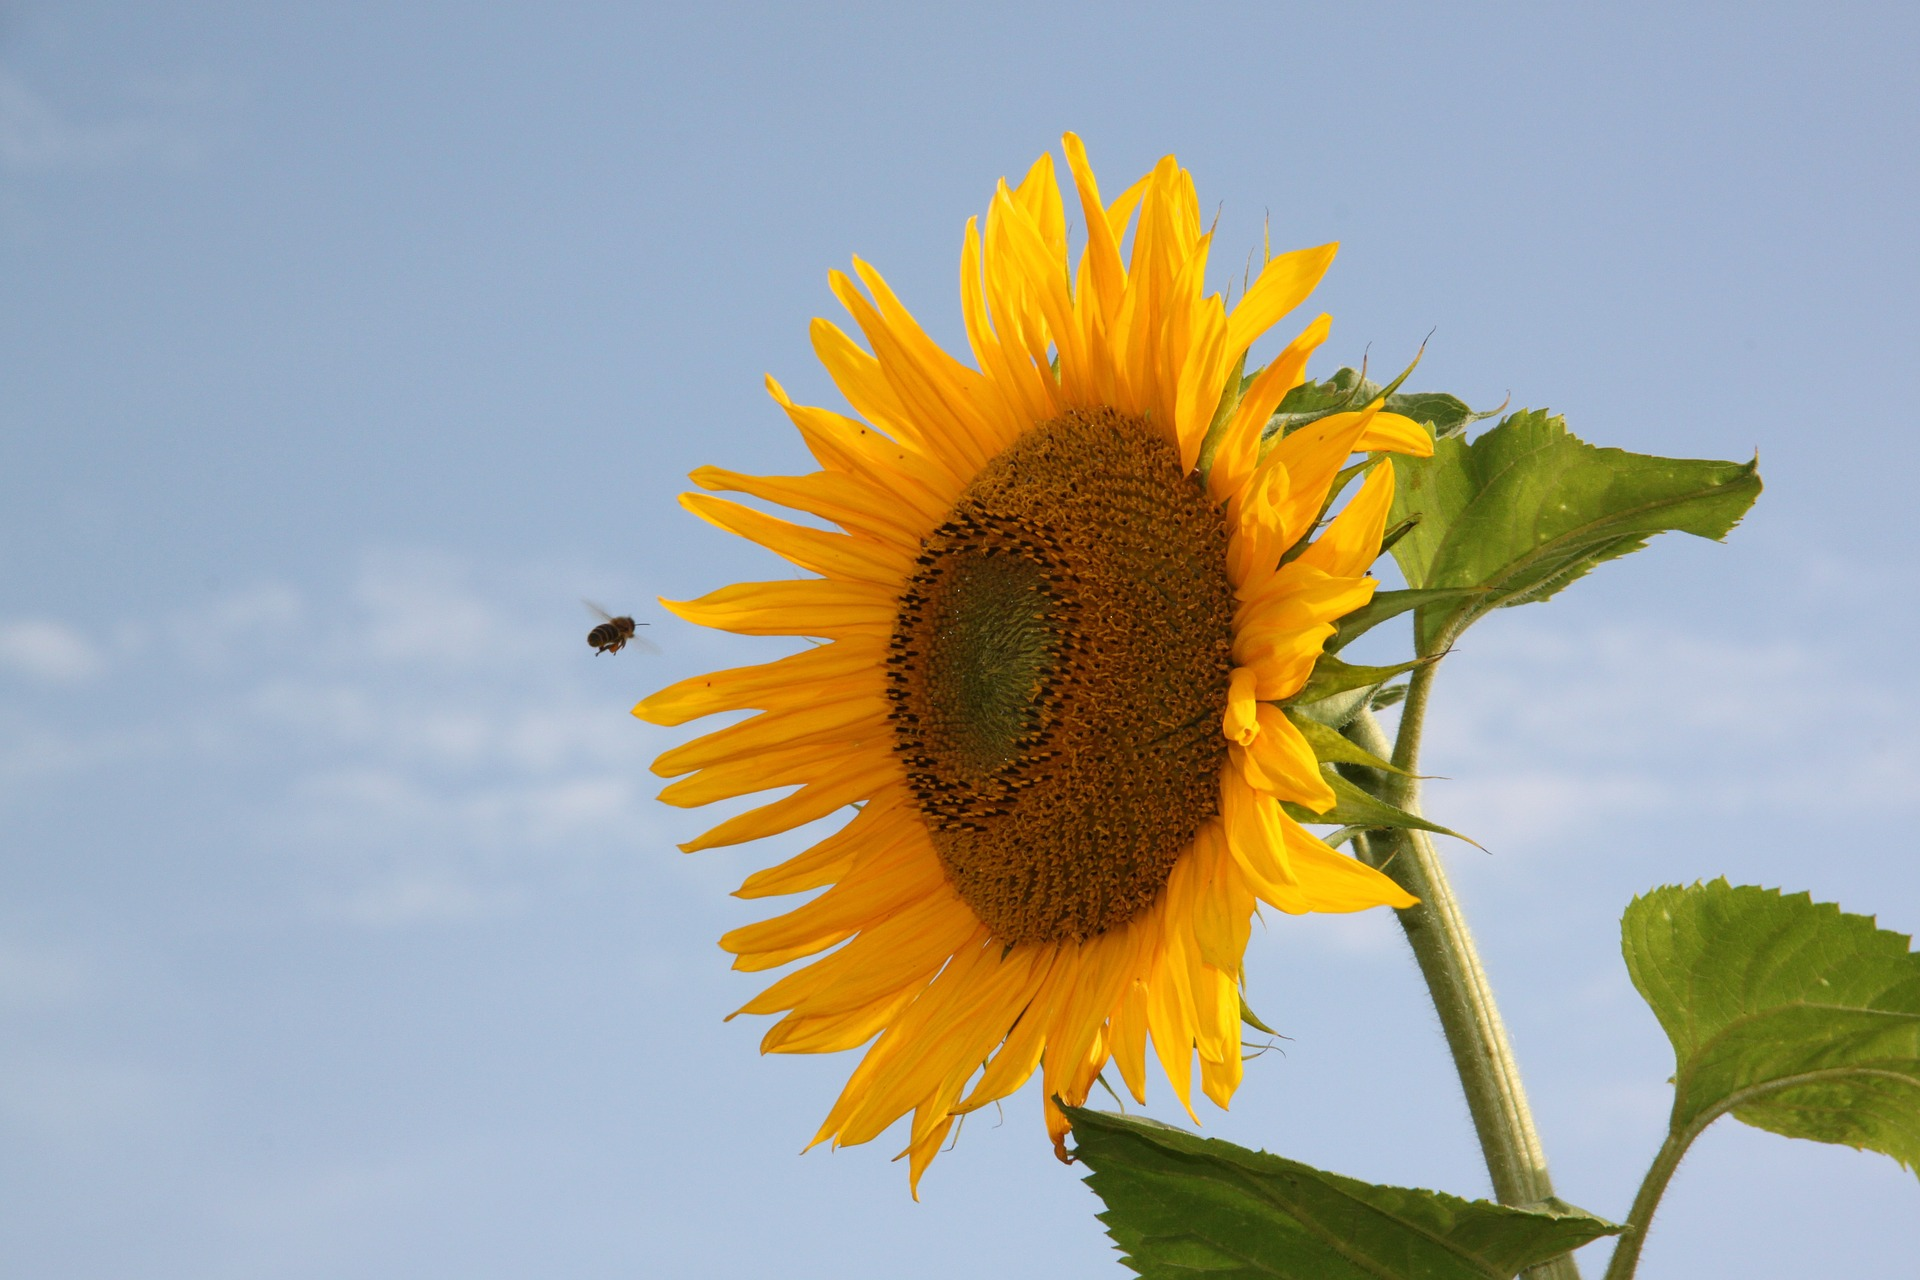 girasol, abeja, polen, verano, cielo - Fondos de Pantalla HD - professor-falken.com